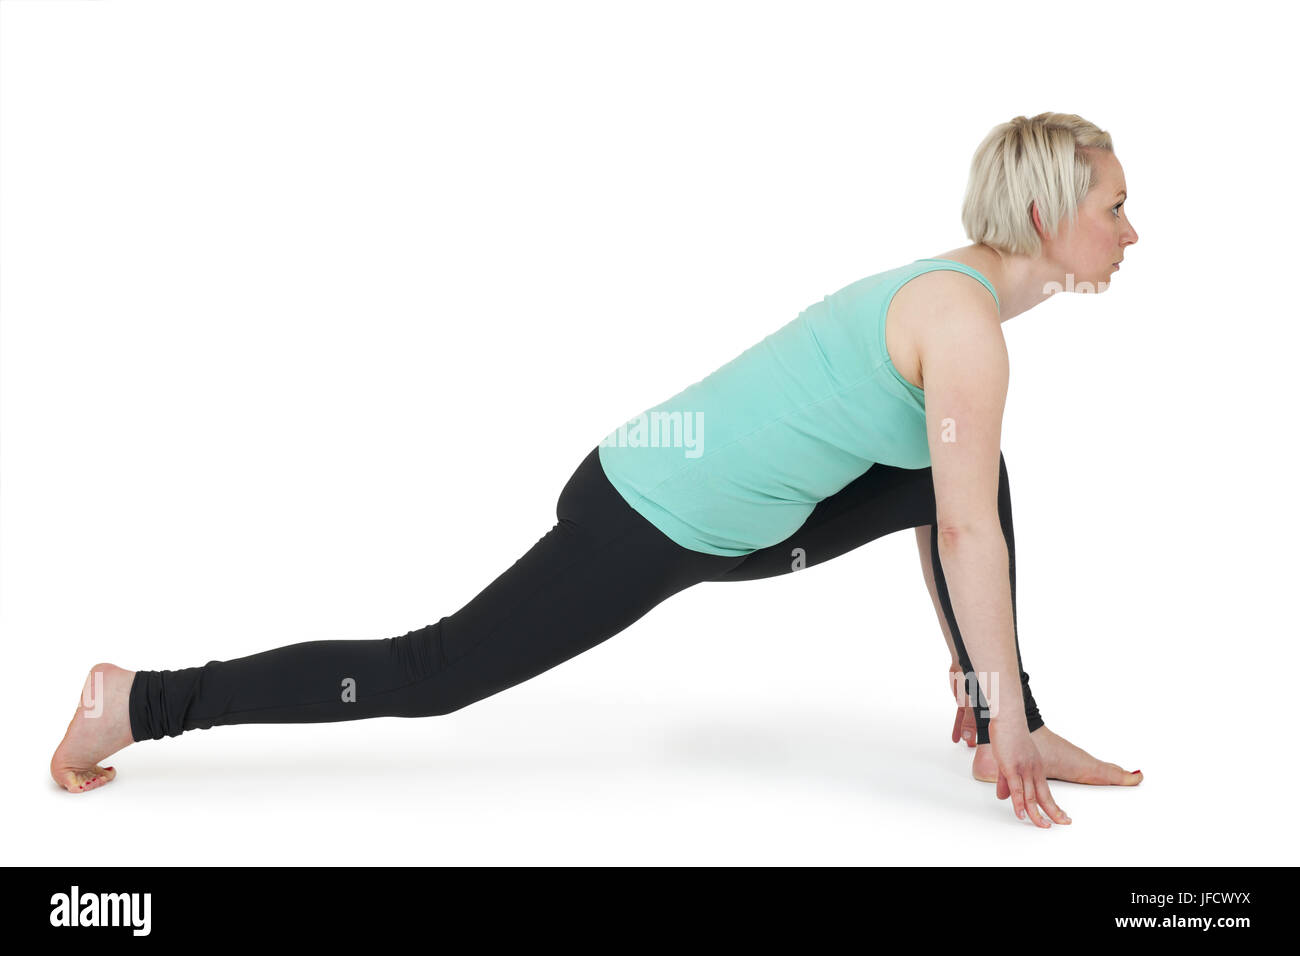 Yoga woman green position_191 Stock Photo